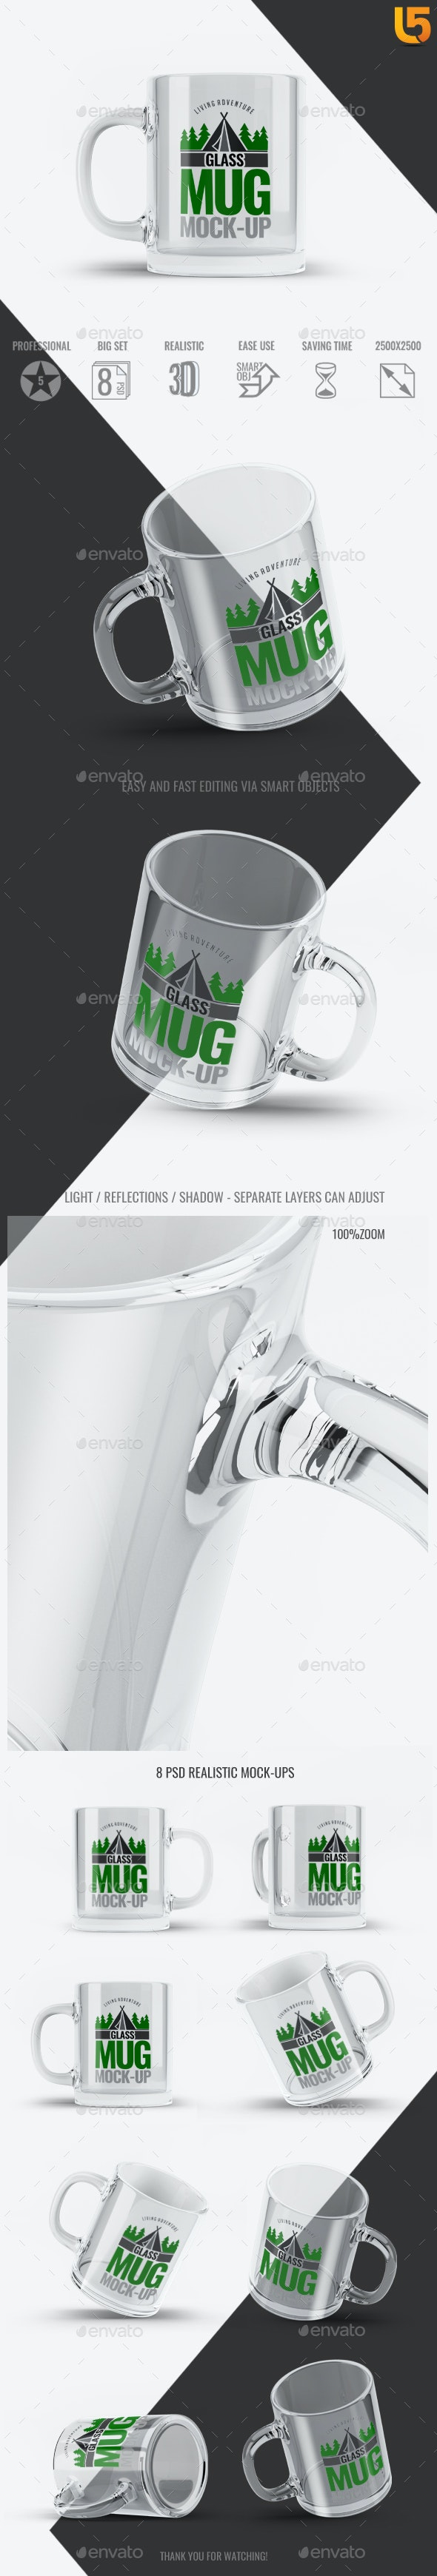 Glass Mug Mock-Up - Food and Drink Packaging